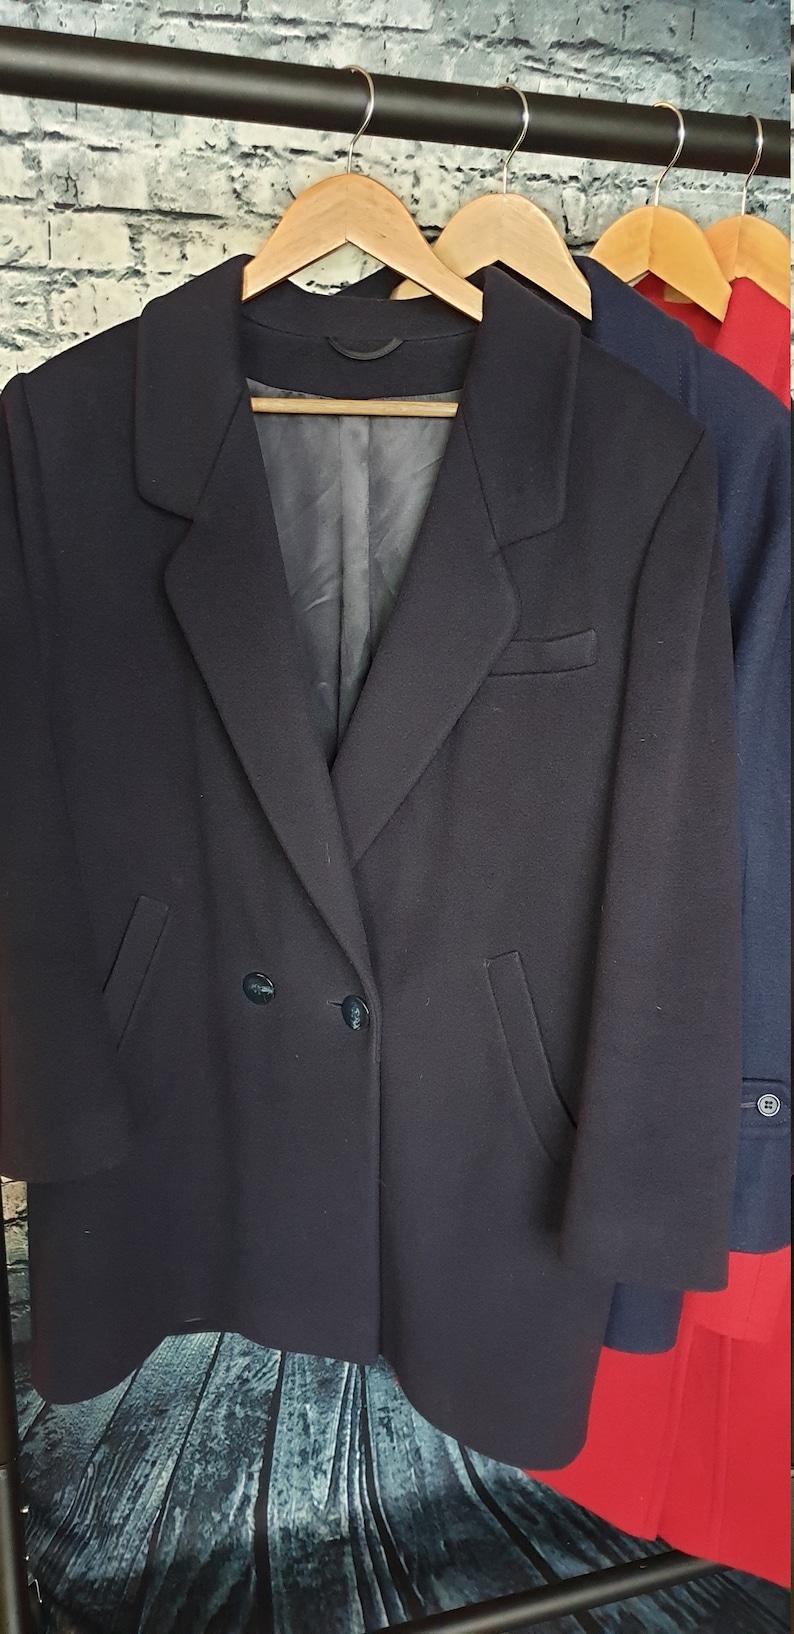 50-50 Cashmere and New Wool Weatherproof Jacket Vintage 80\u2019s Marks /& Spencer \u201cSt. Michael\u201d UK Size 14 Dark Navy Blue.